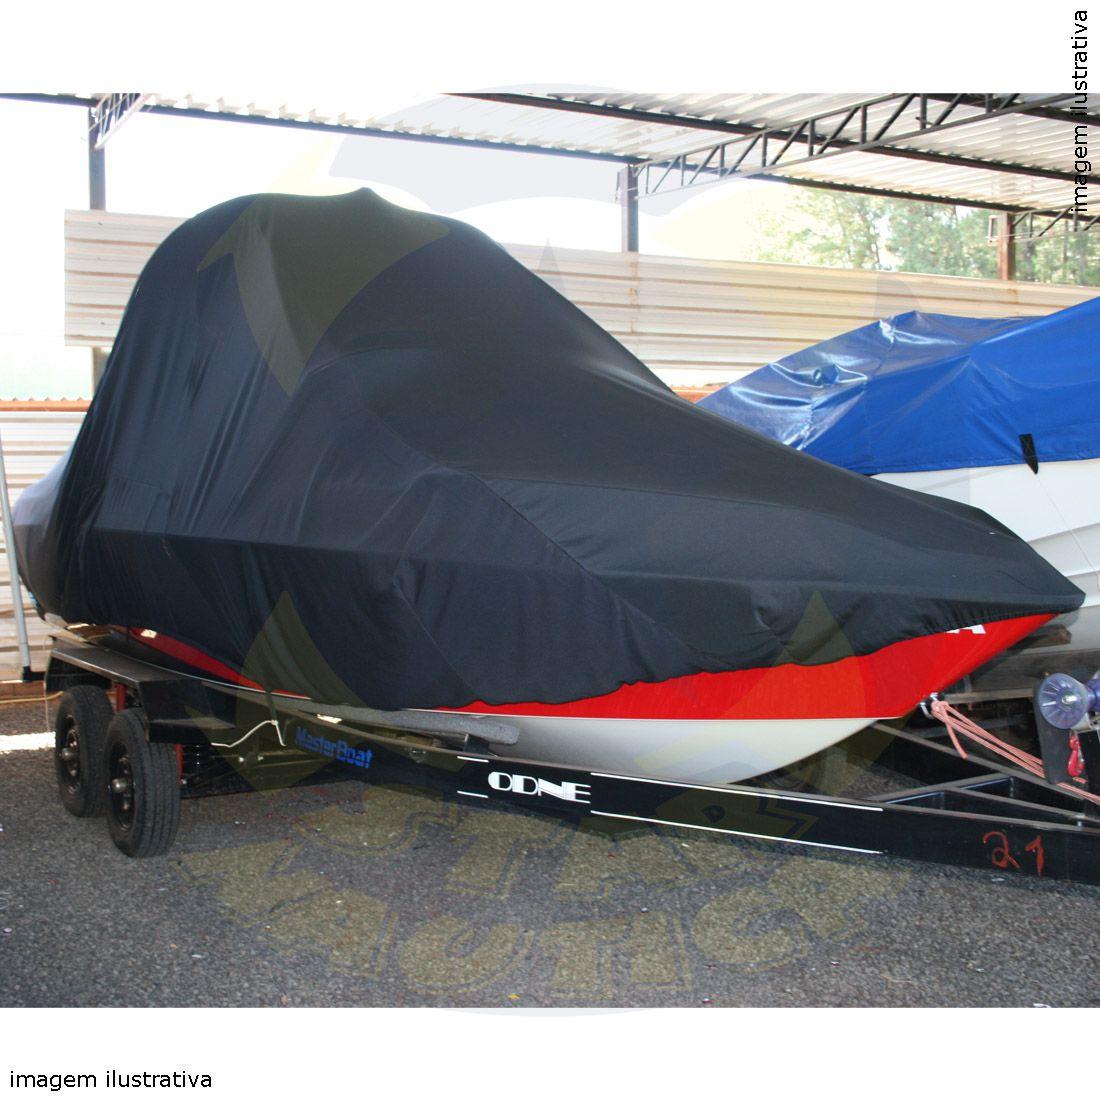 Capa Lona de Cobertura Lancha Focker 230 Black Edition com Targa Lona Emborrachada